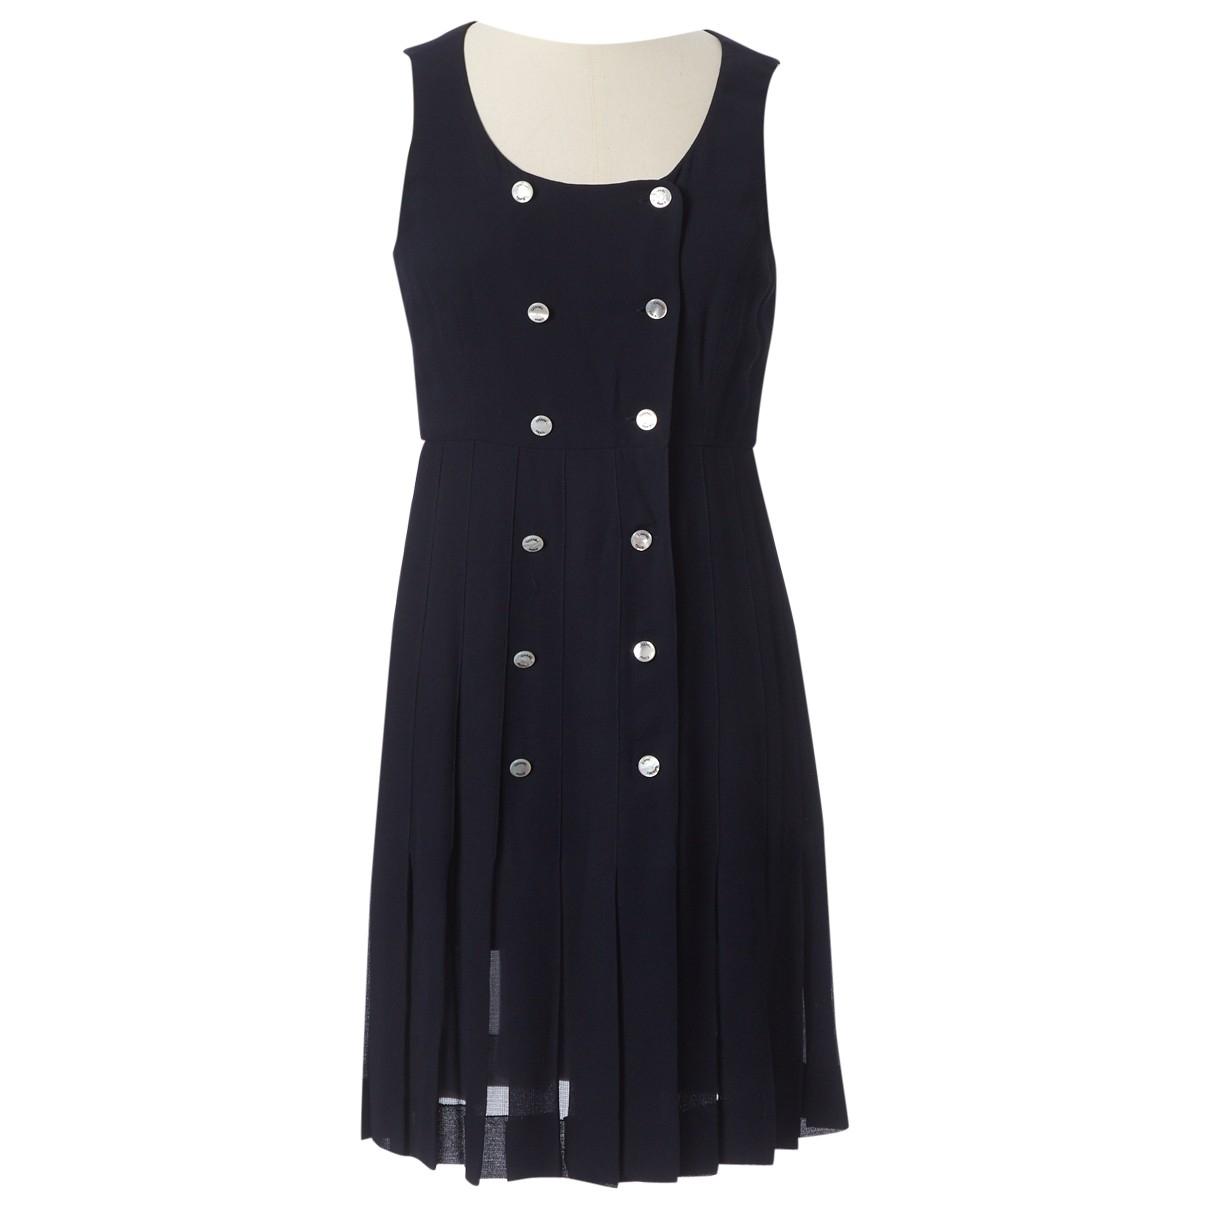 Chanel \N Blue dress for Women 38 FR